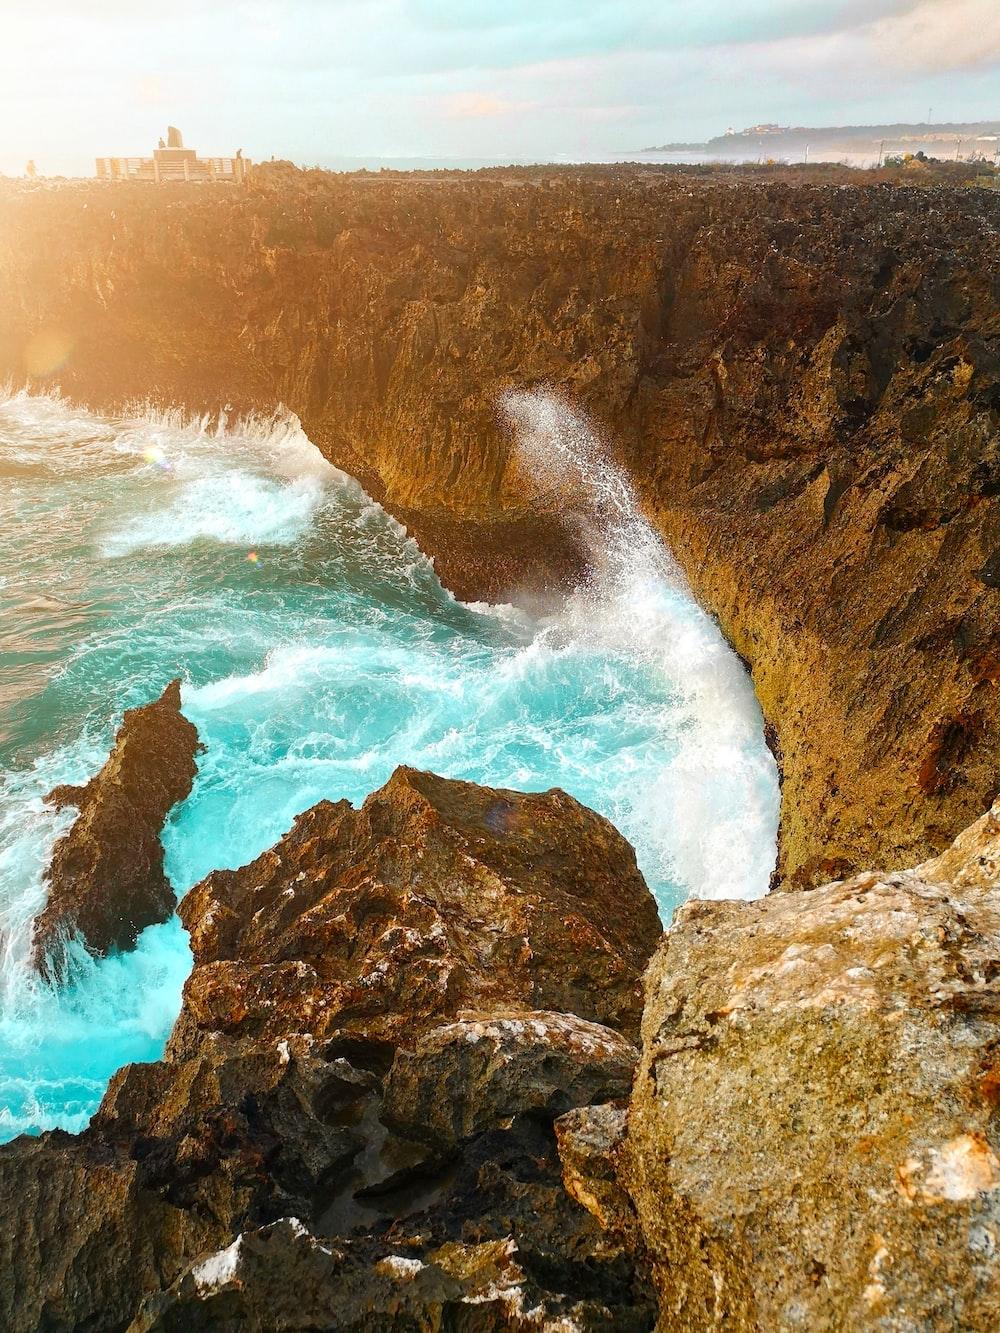 water waves hitting brown rock formation during daytime